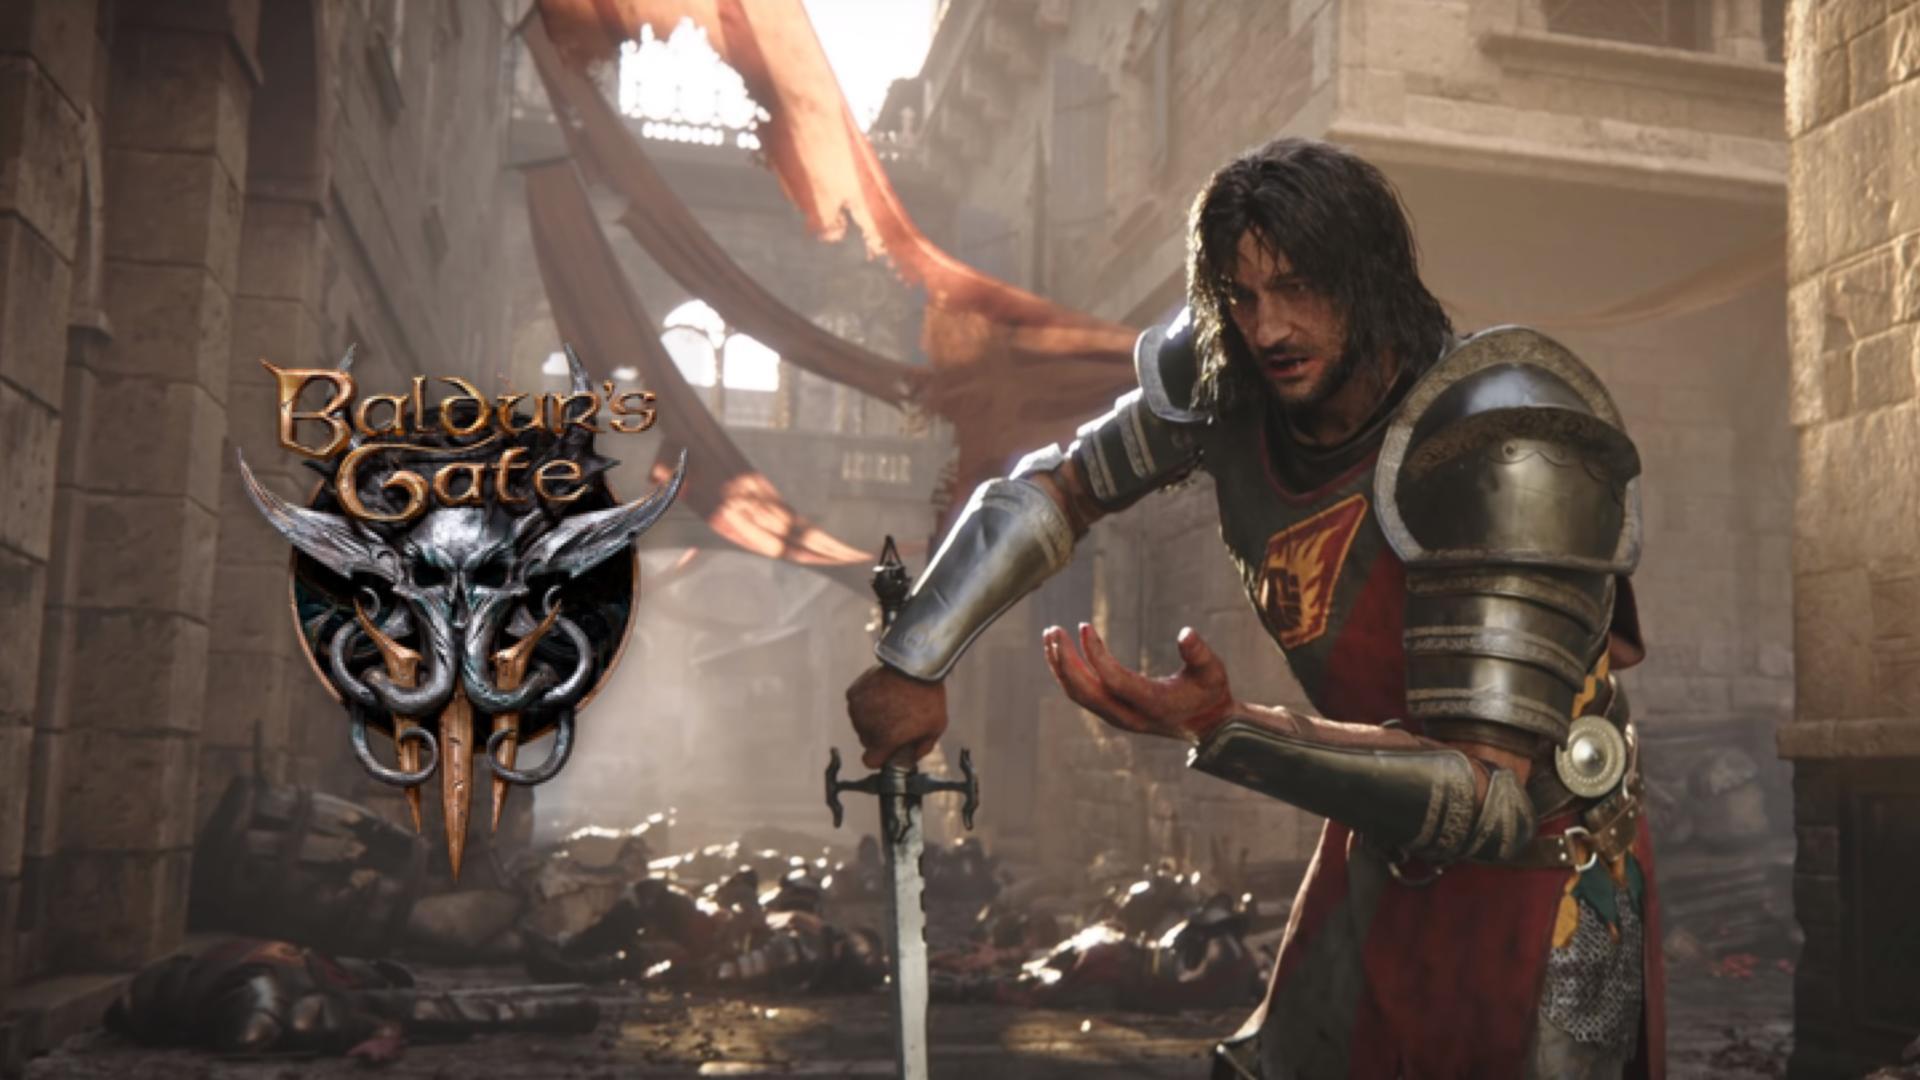 5 BEST UPCOMING RPG GAMES LIKE BALDUR'S GATE